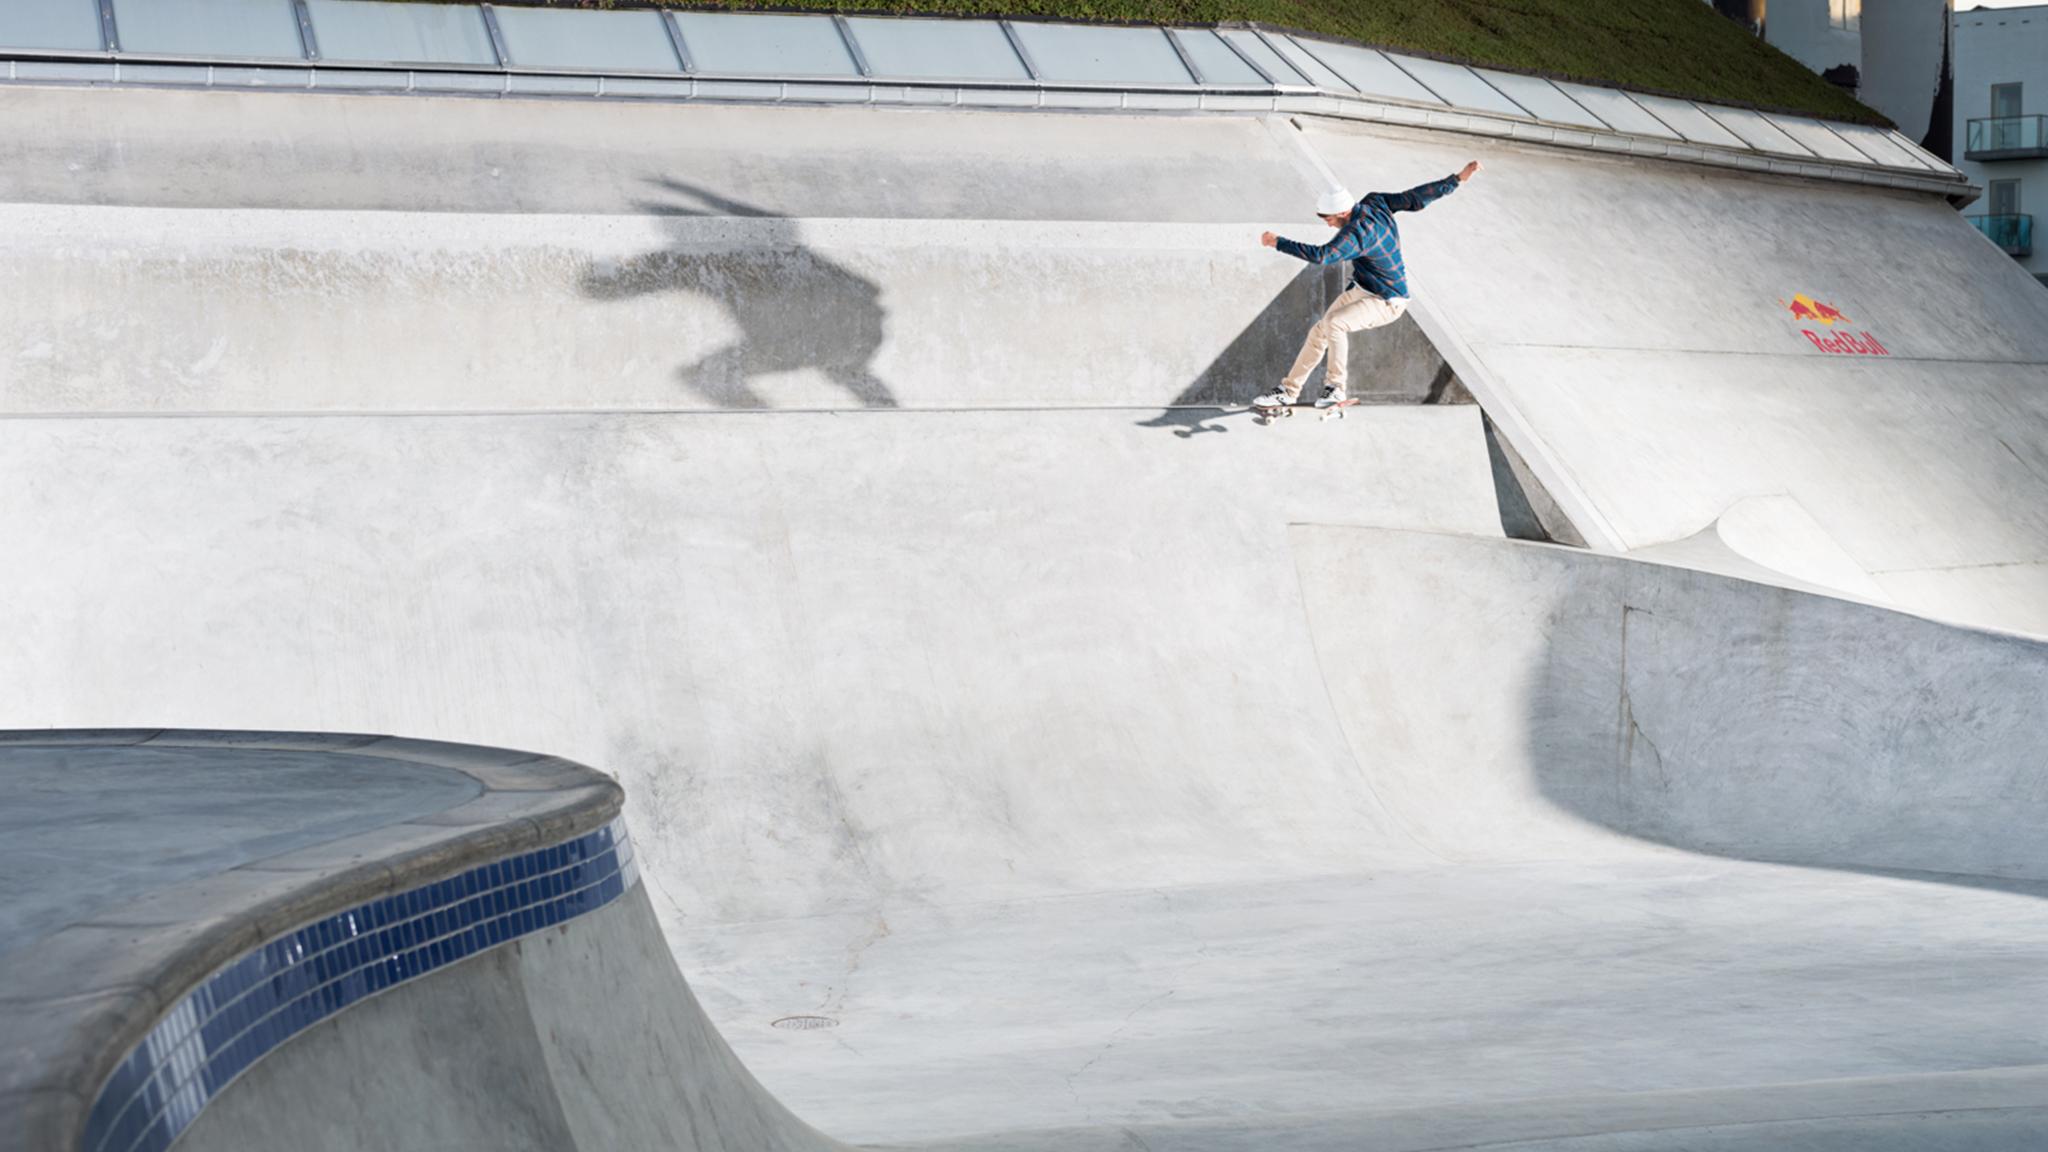 Rune Glifberg, gap to tailslide at Streetdome.